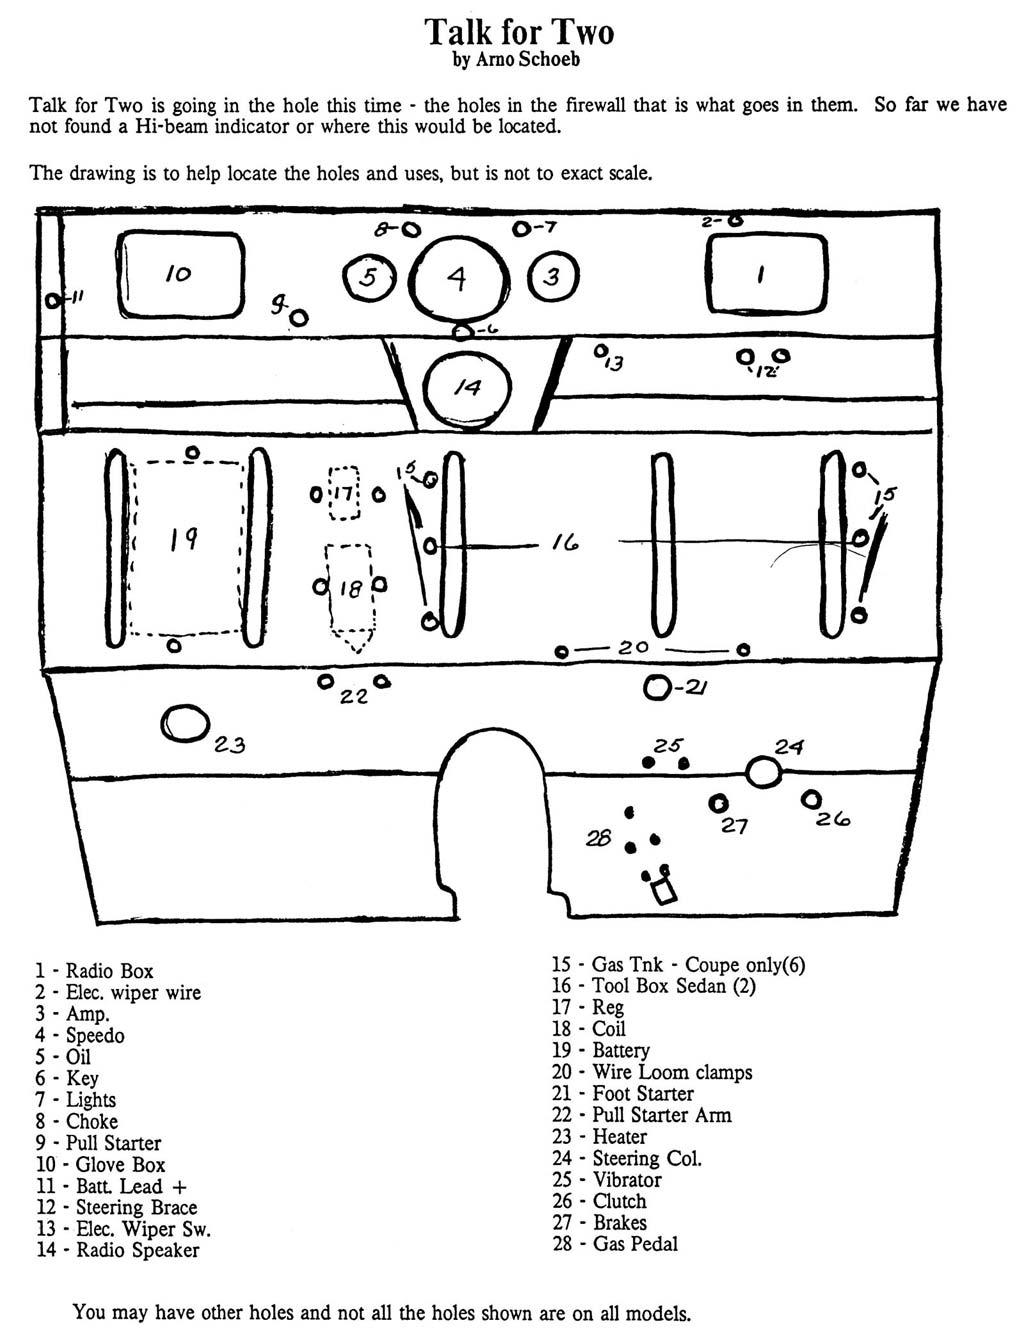 Details On Crosley Prewar Models 1939